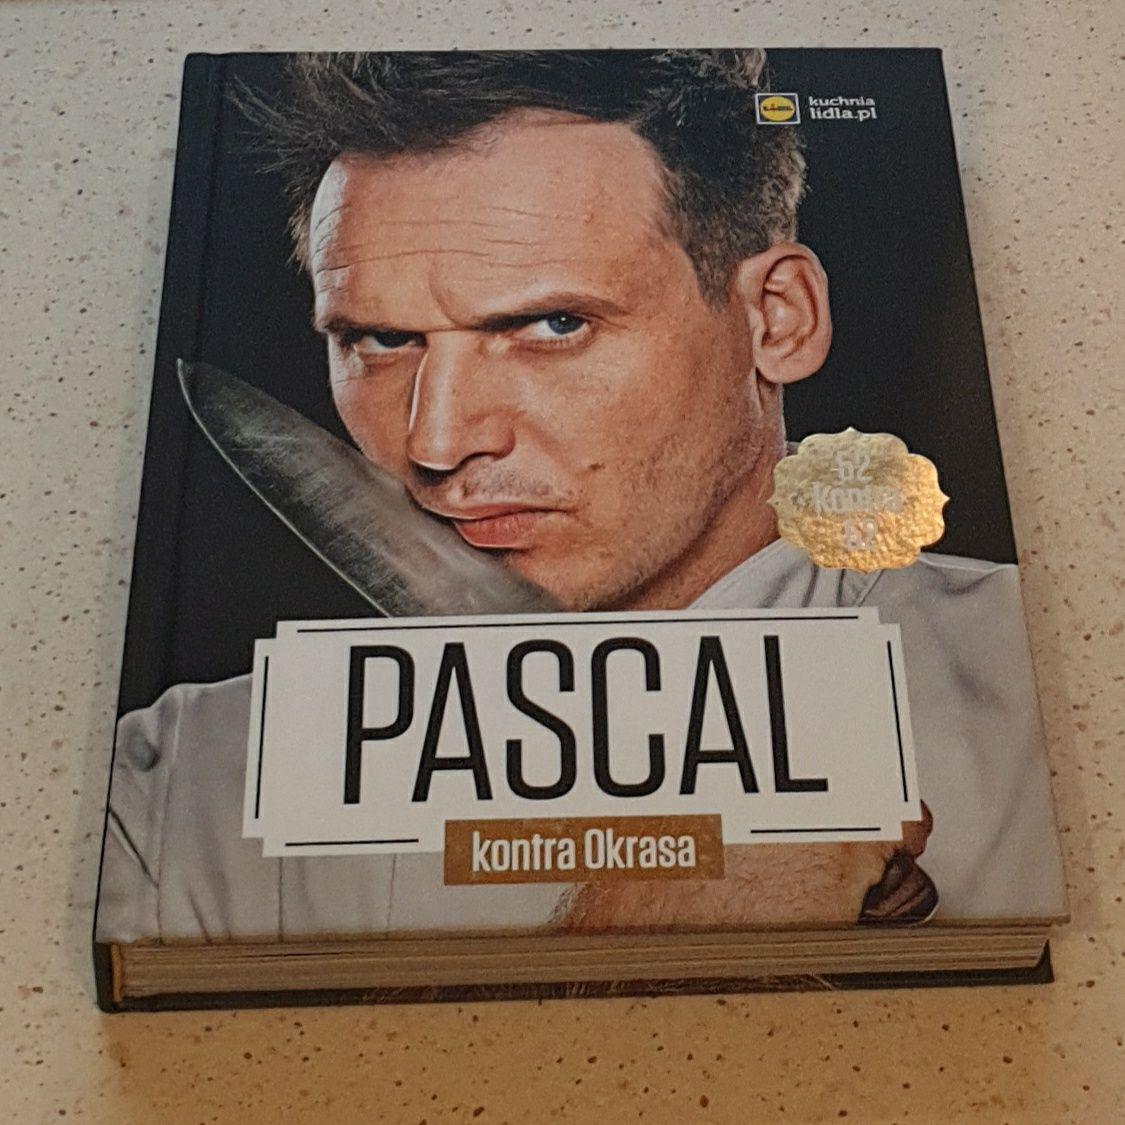 Książka okrasa kontra Pascal lidl 52 kontra 52